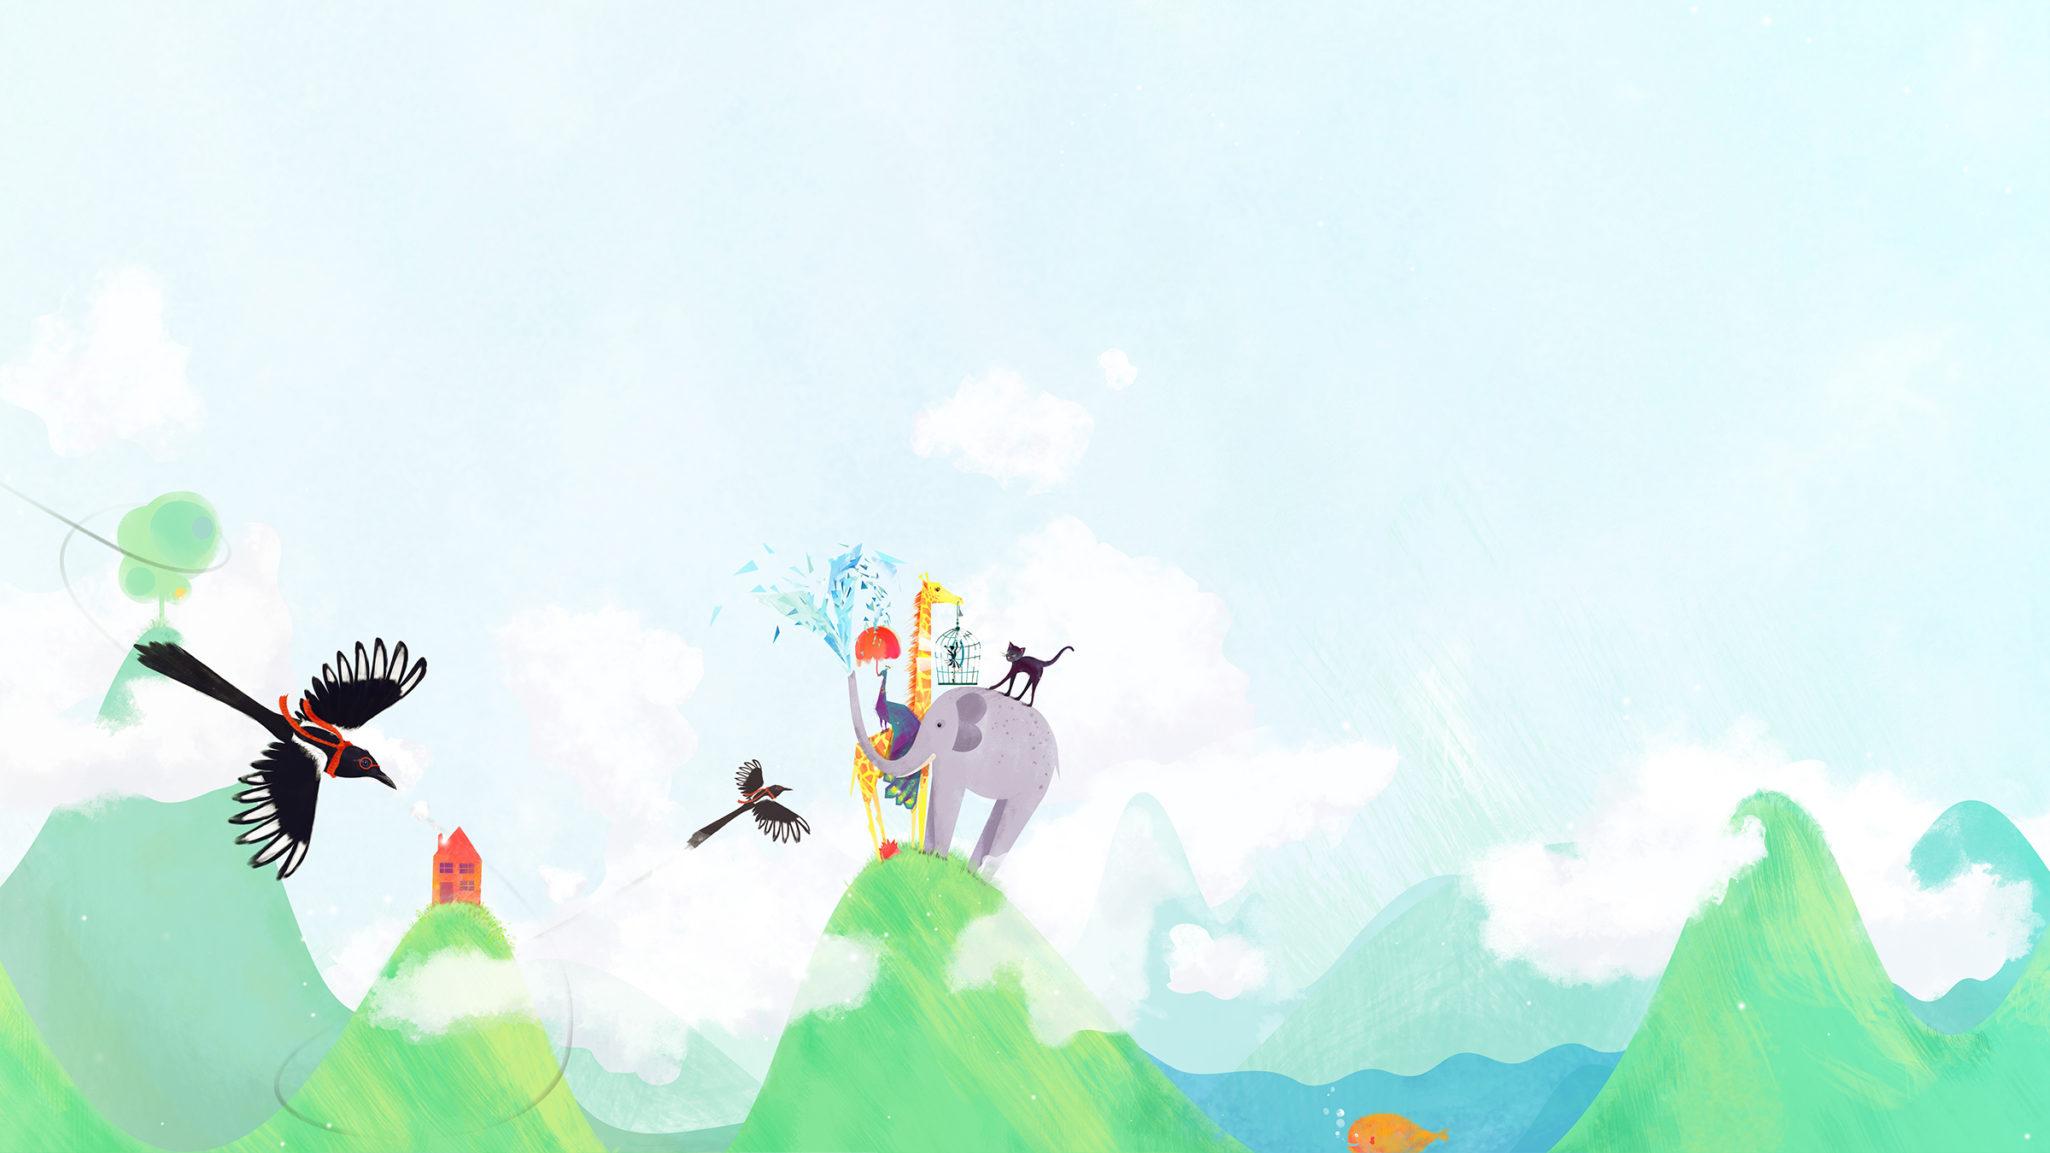 Styleframe: Magpie, cat, elephant, giraffe, peacock, fish and hedgehog